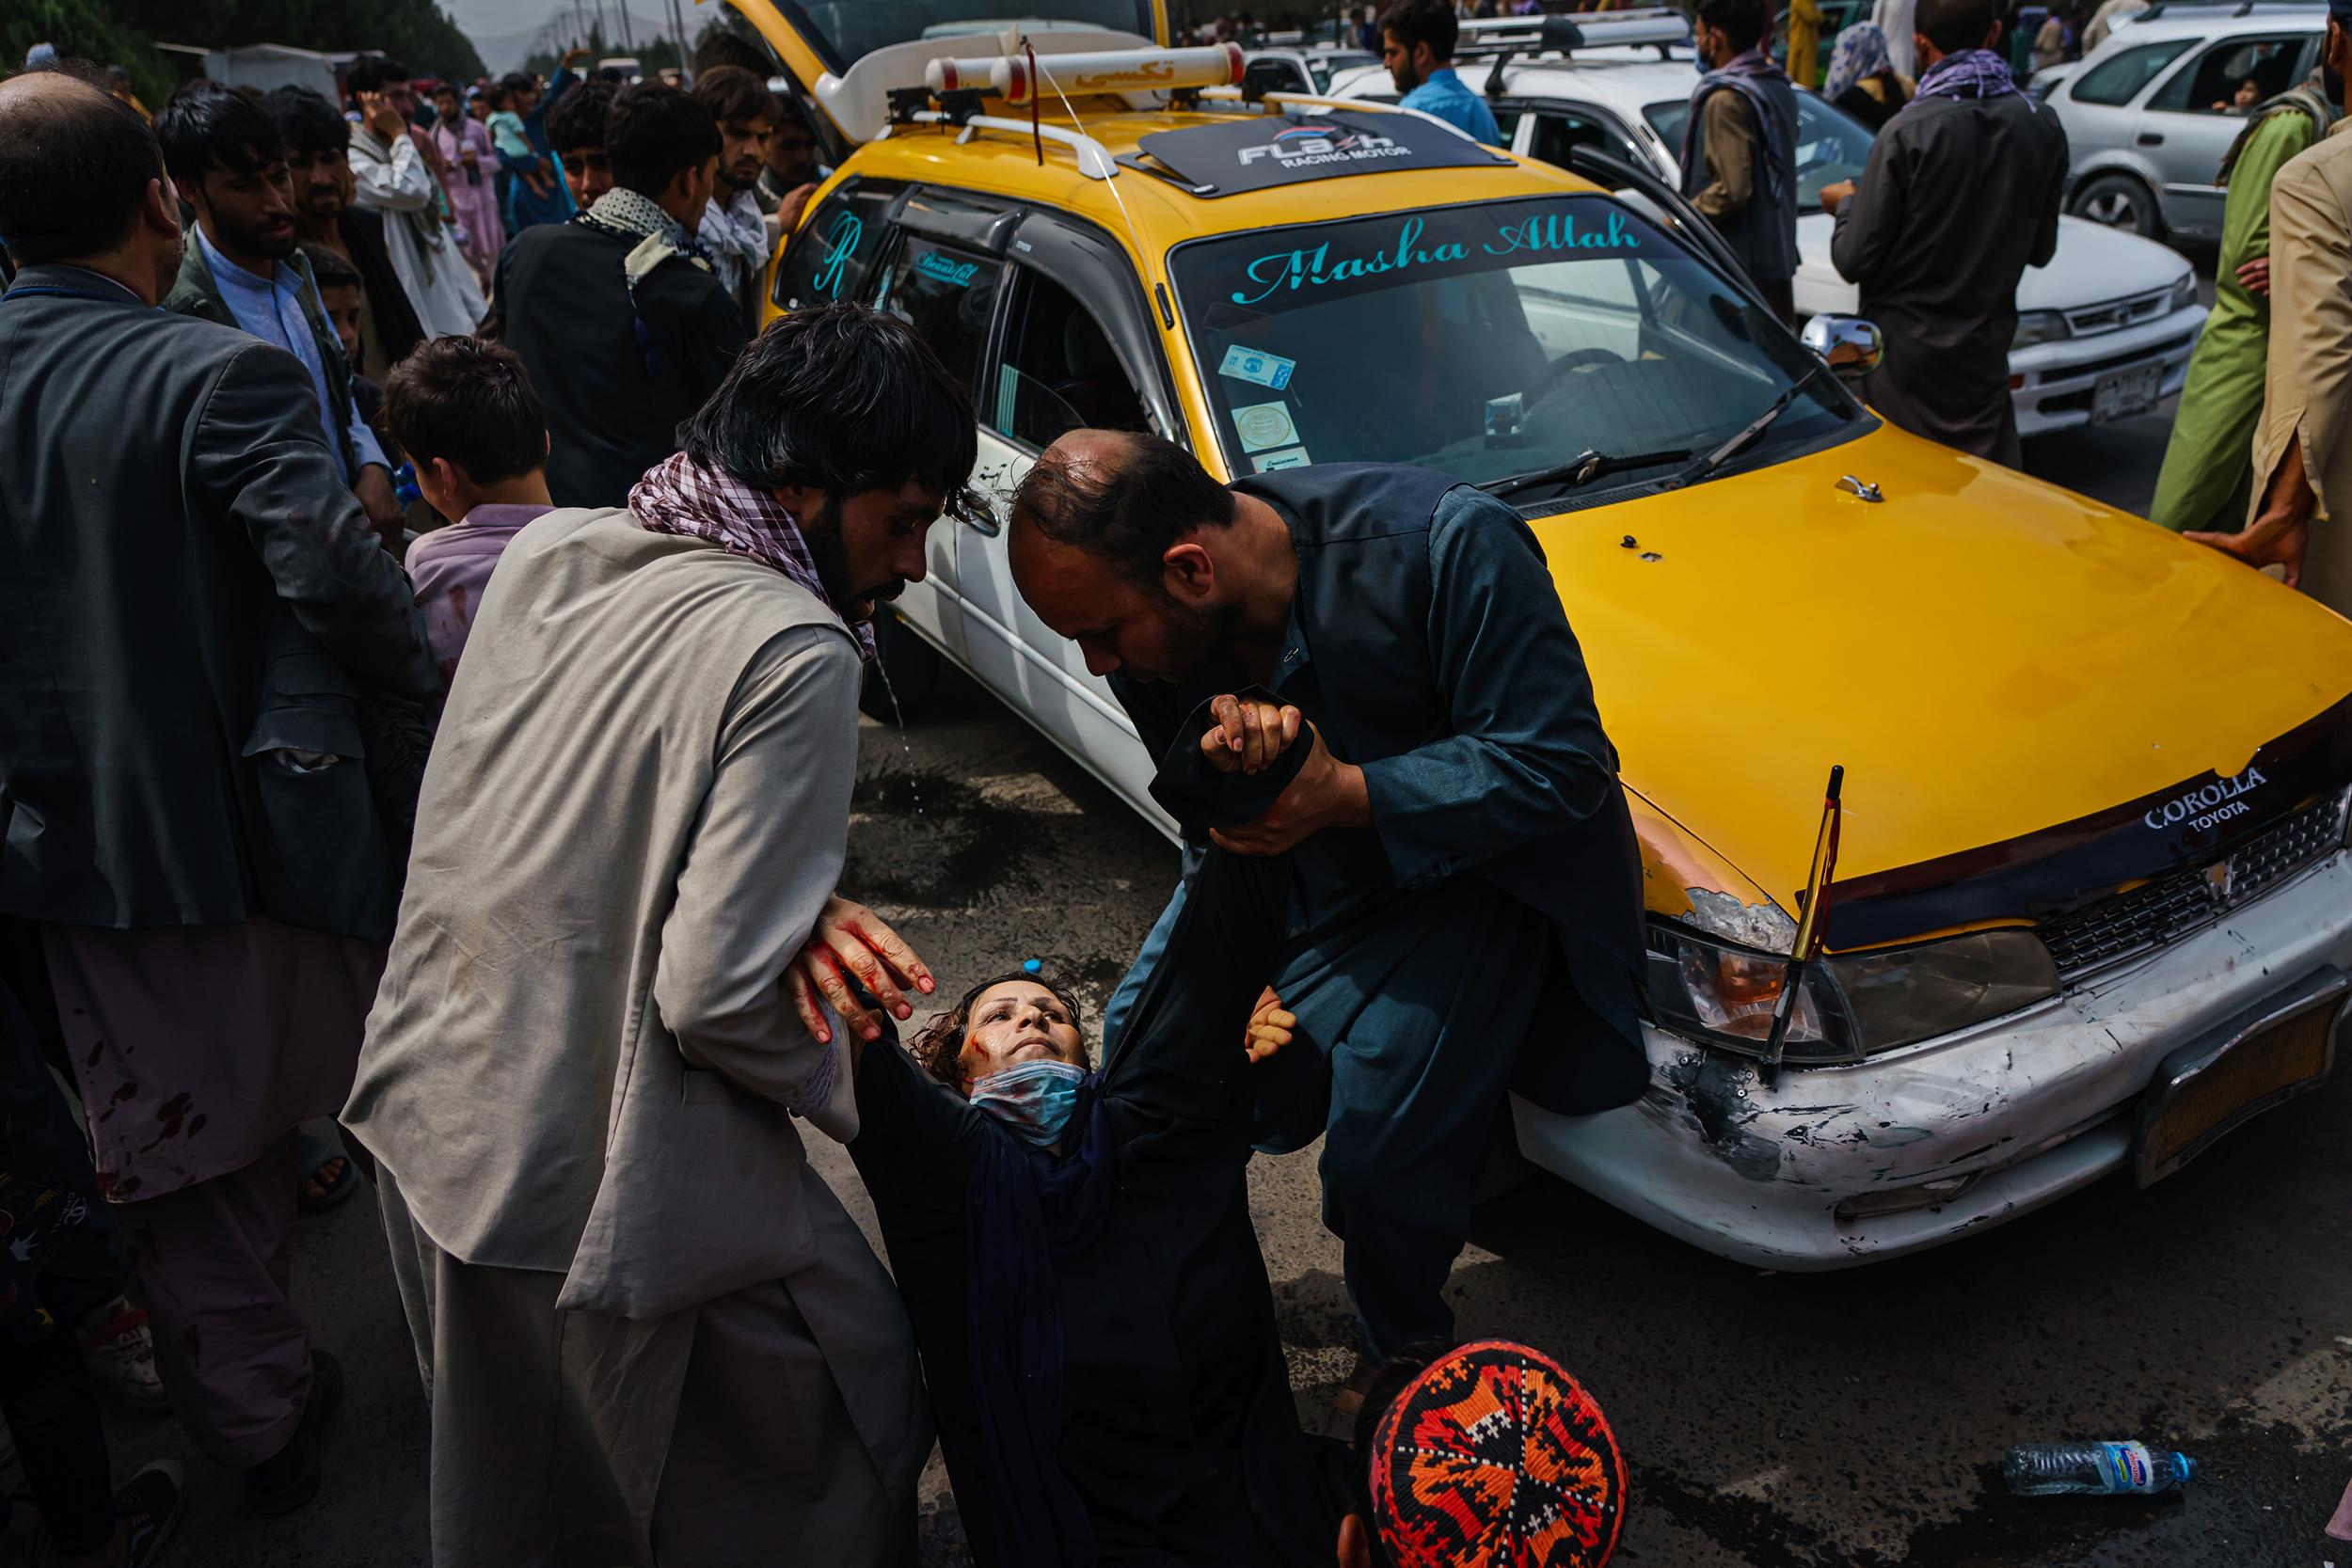 Afghanistan war critics need to look in the mirror